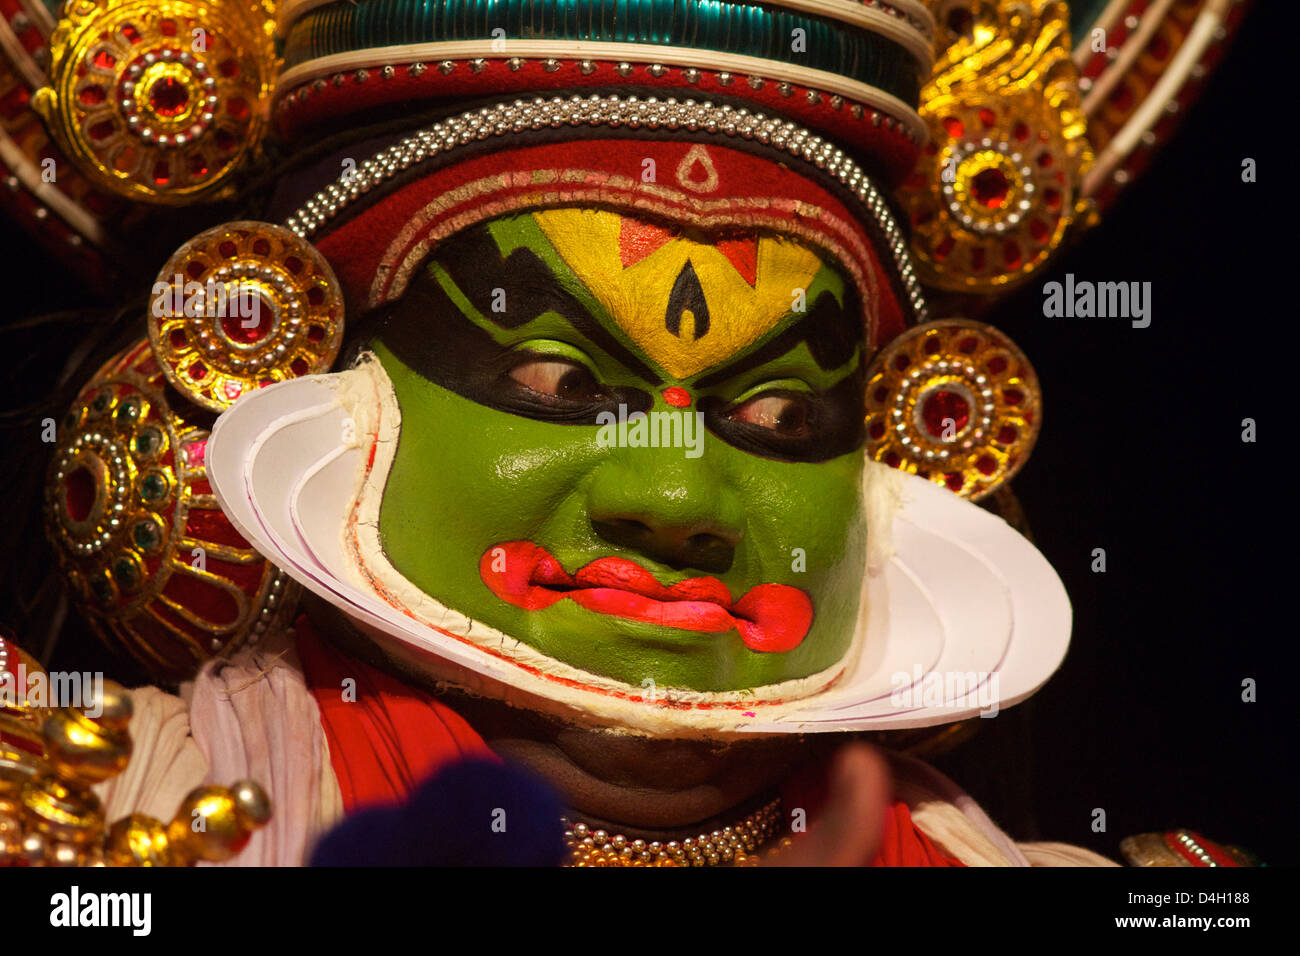 Spettacolo di Kutiyattam, teatro indiana di Kochi, in Kerala, India Immagini Stock